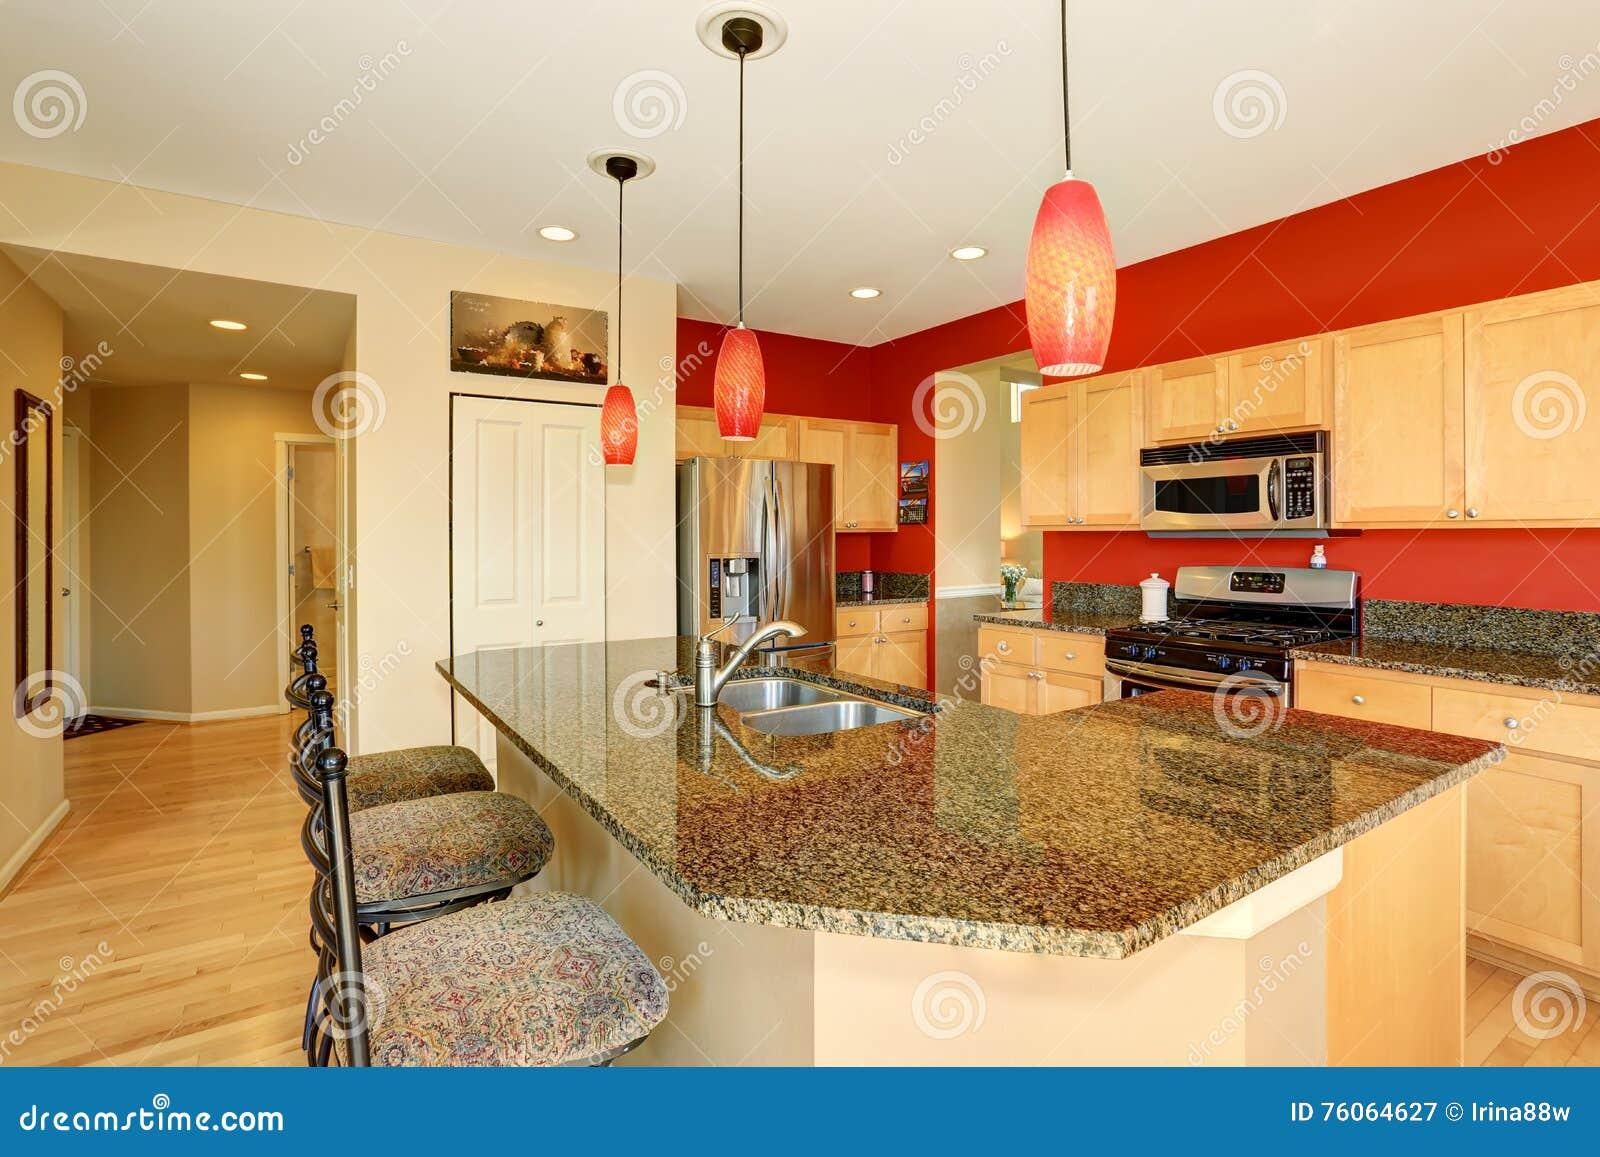 Küchenrauminnenraum mit roter Wand, Granitgegenspitze und Insel